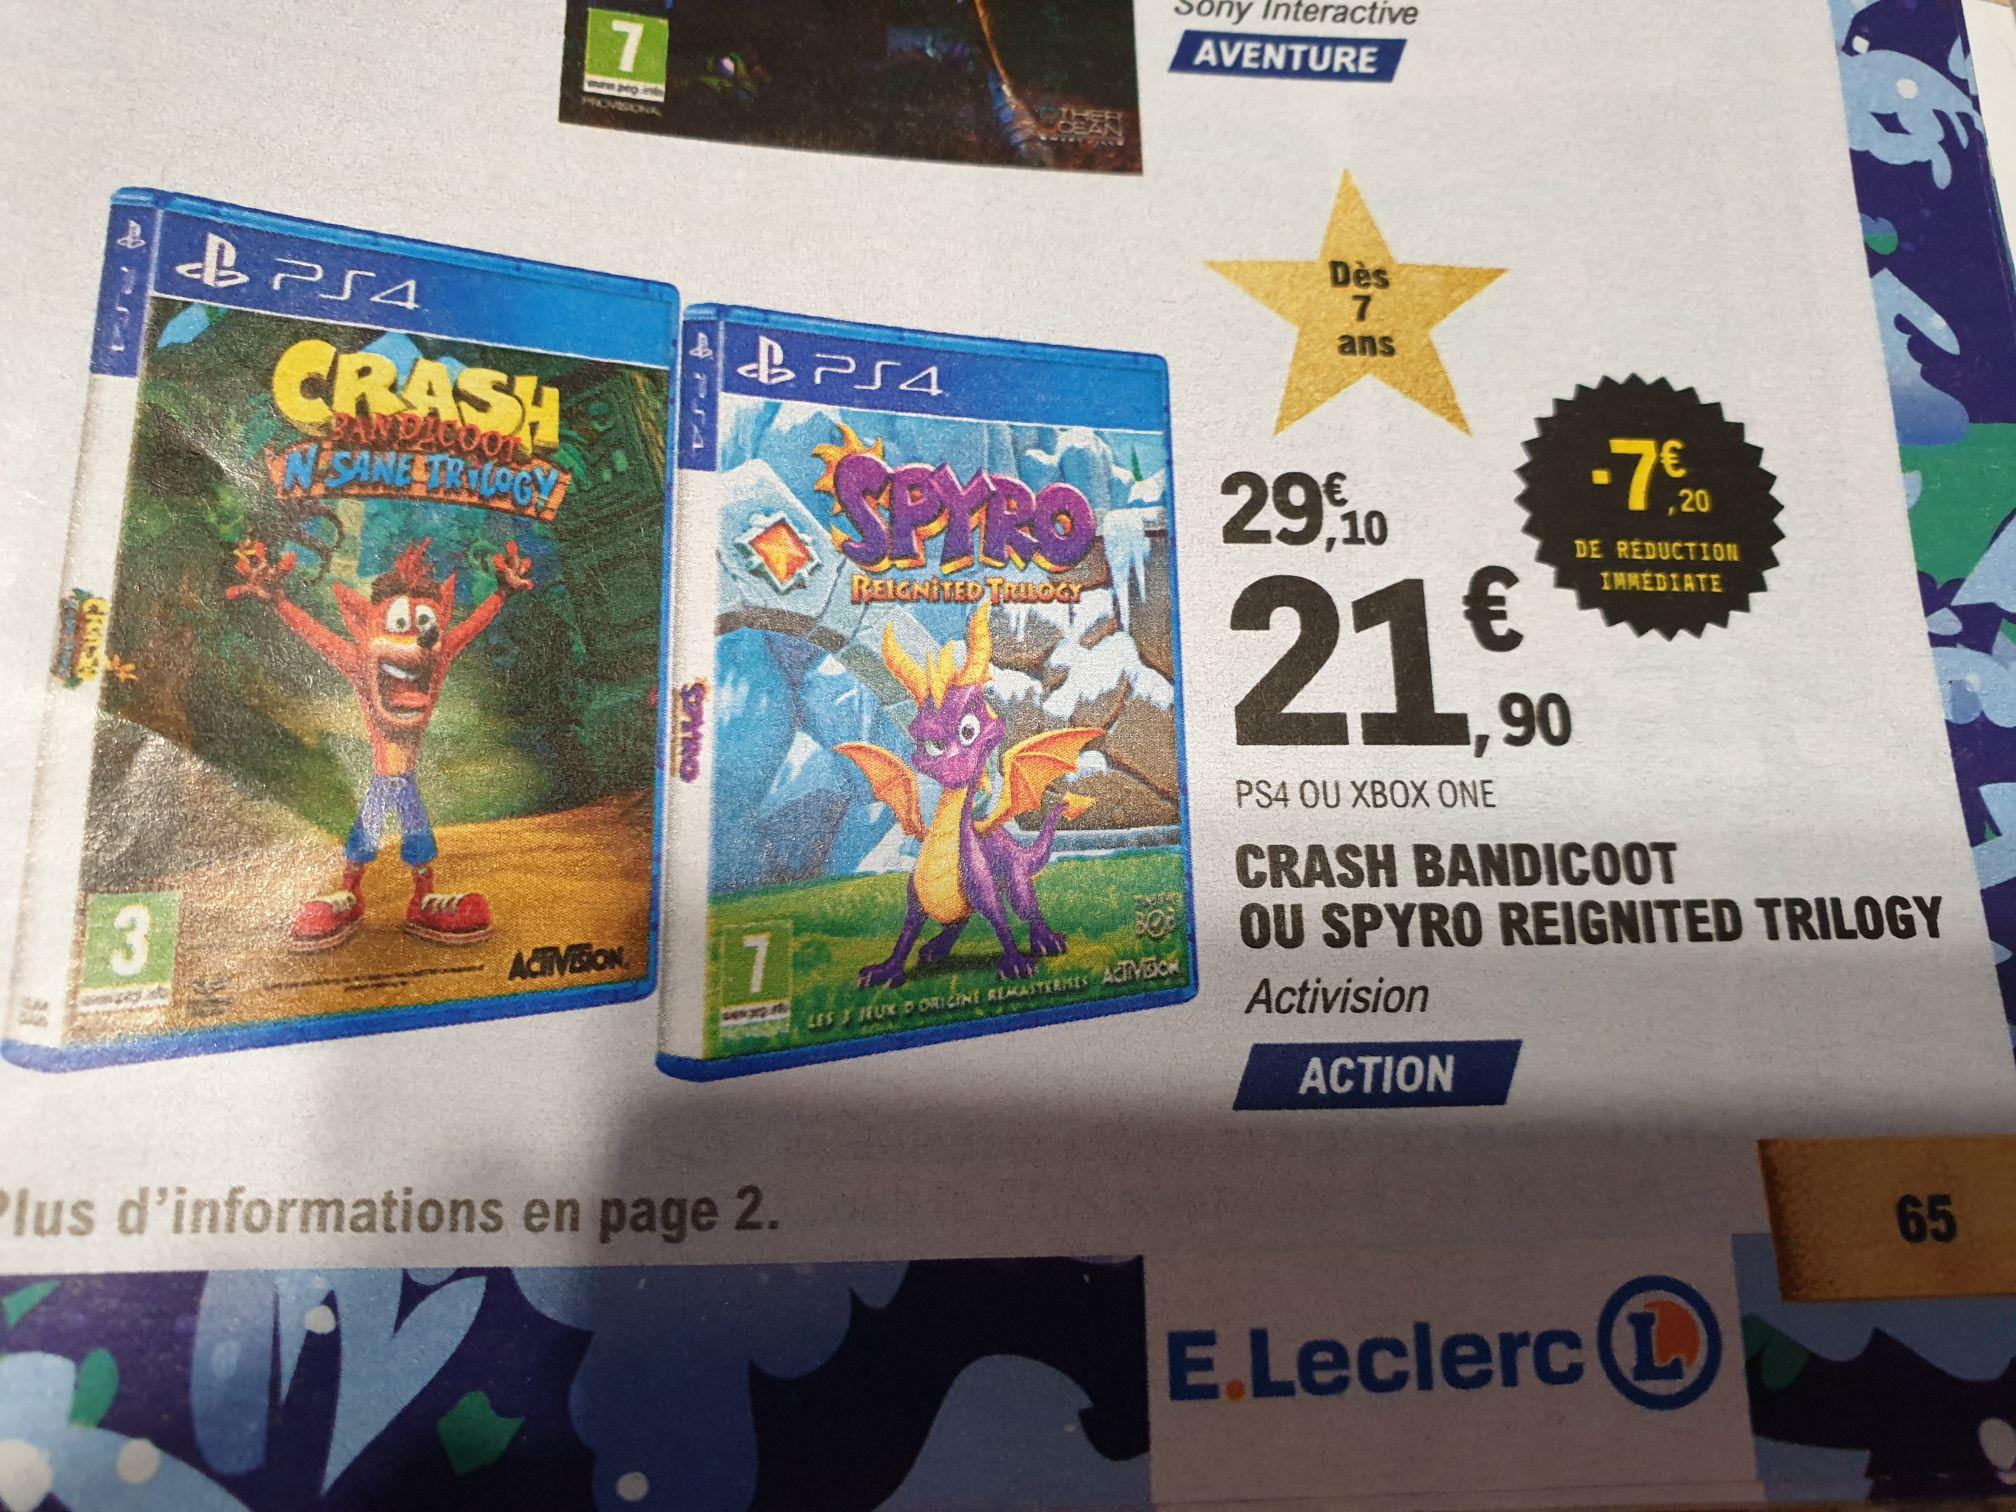 Crash Bandicoot ou Spyro Reignited Trilogy sur PlayStation 4